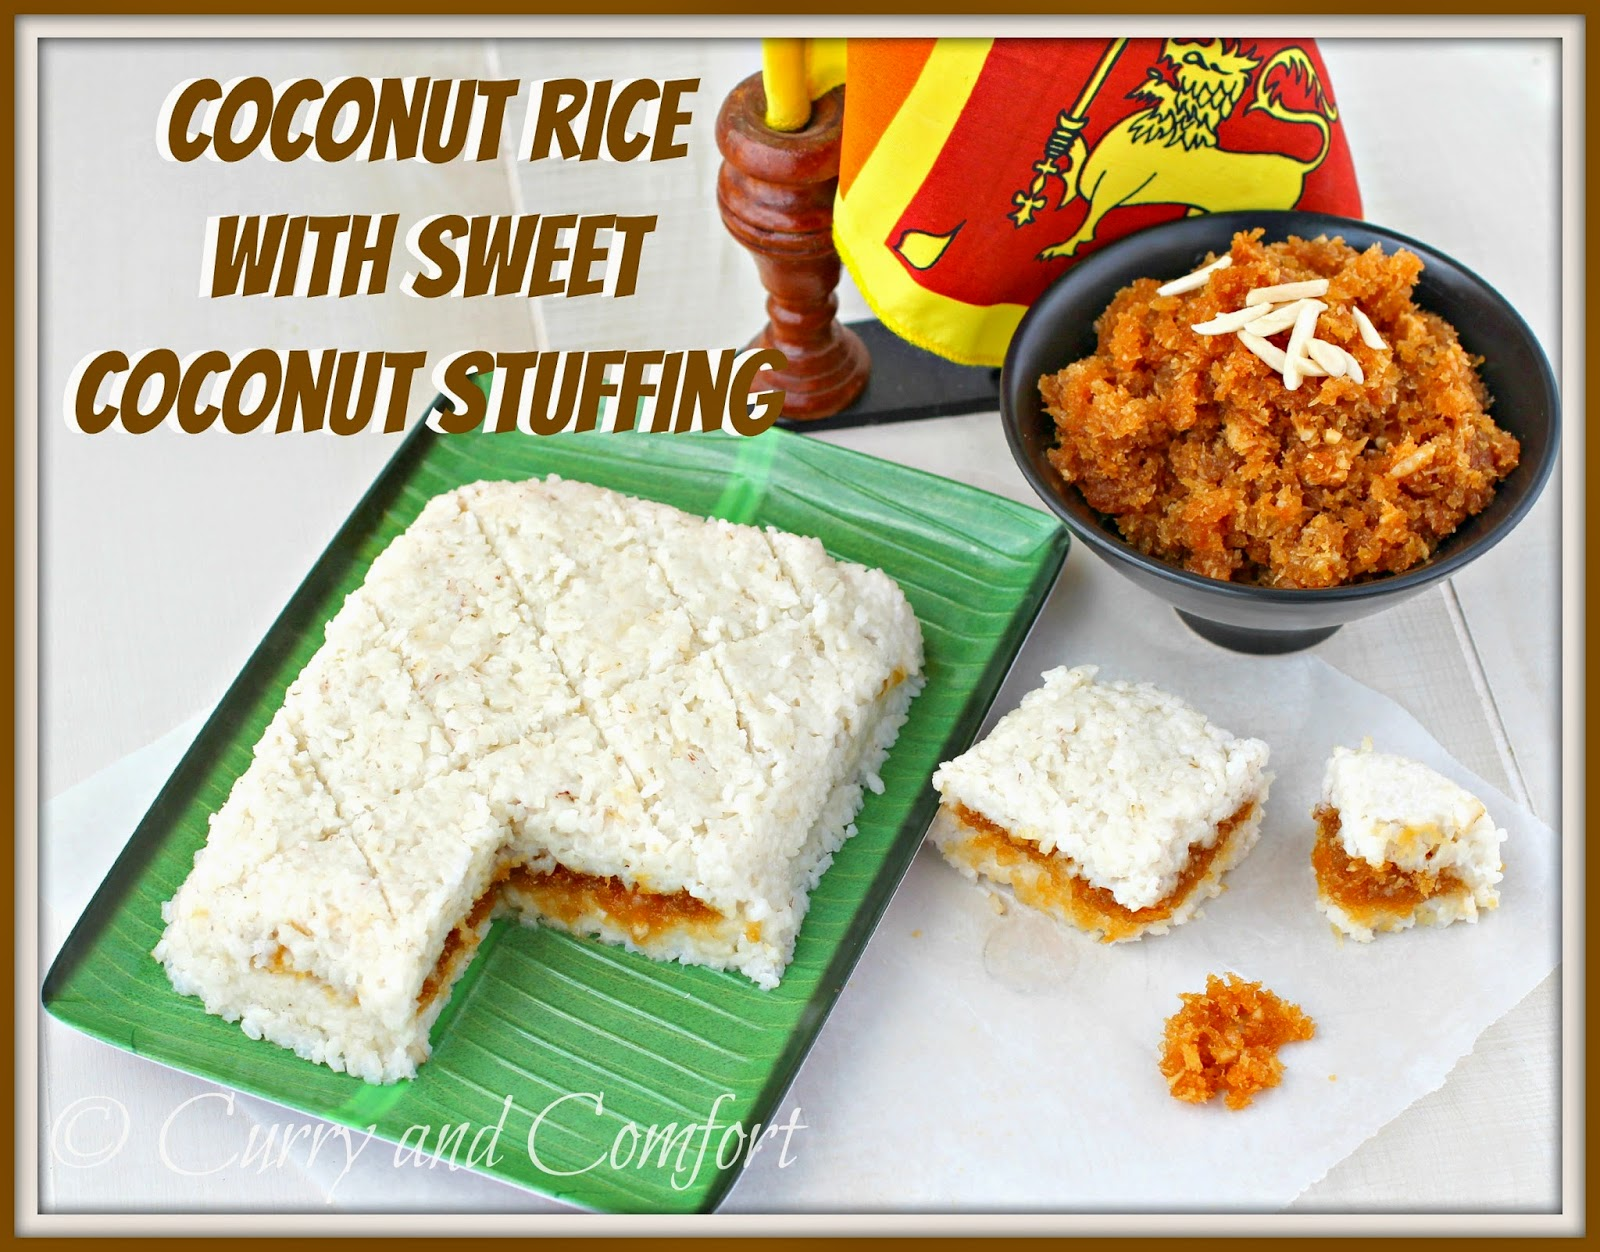 Sri Lanka Cake Recipes In Sinhala Language: Kitchen Simmer: Sri Lankan Coconut Milk Rice With Sweet